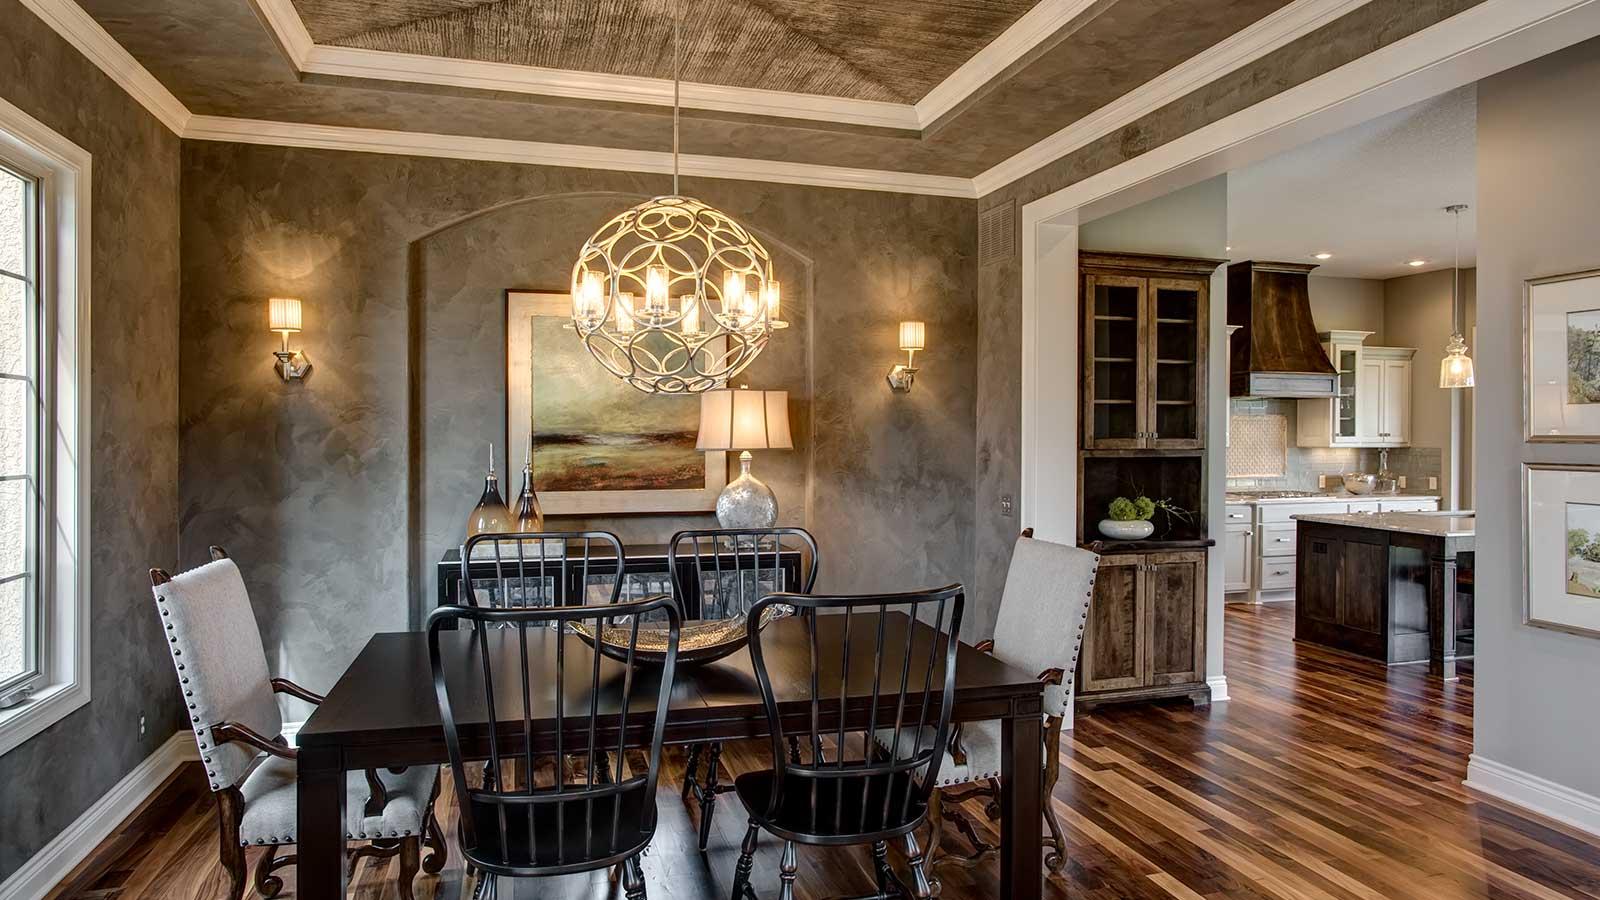 Interior Design Firms Kansas City Kansas City Interior Design Firms Dining Set For 8